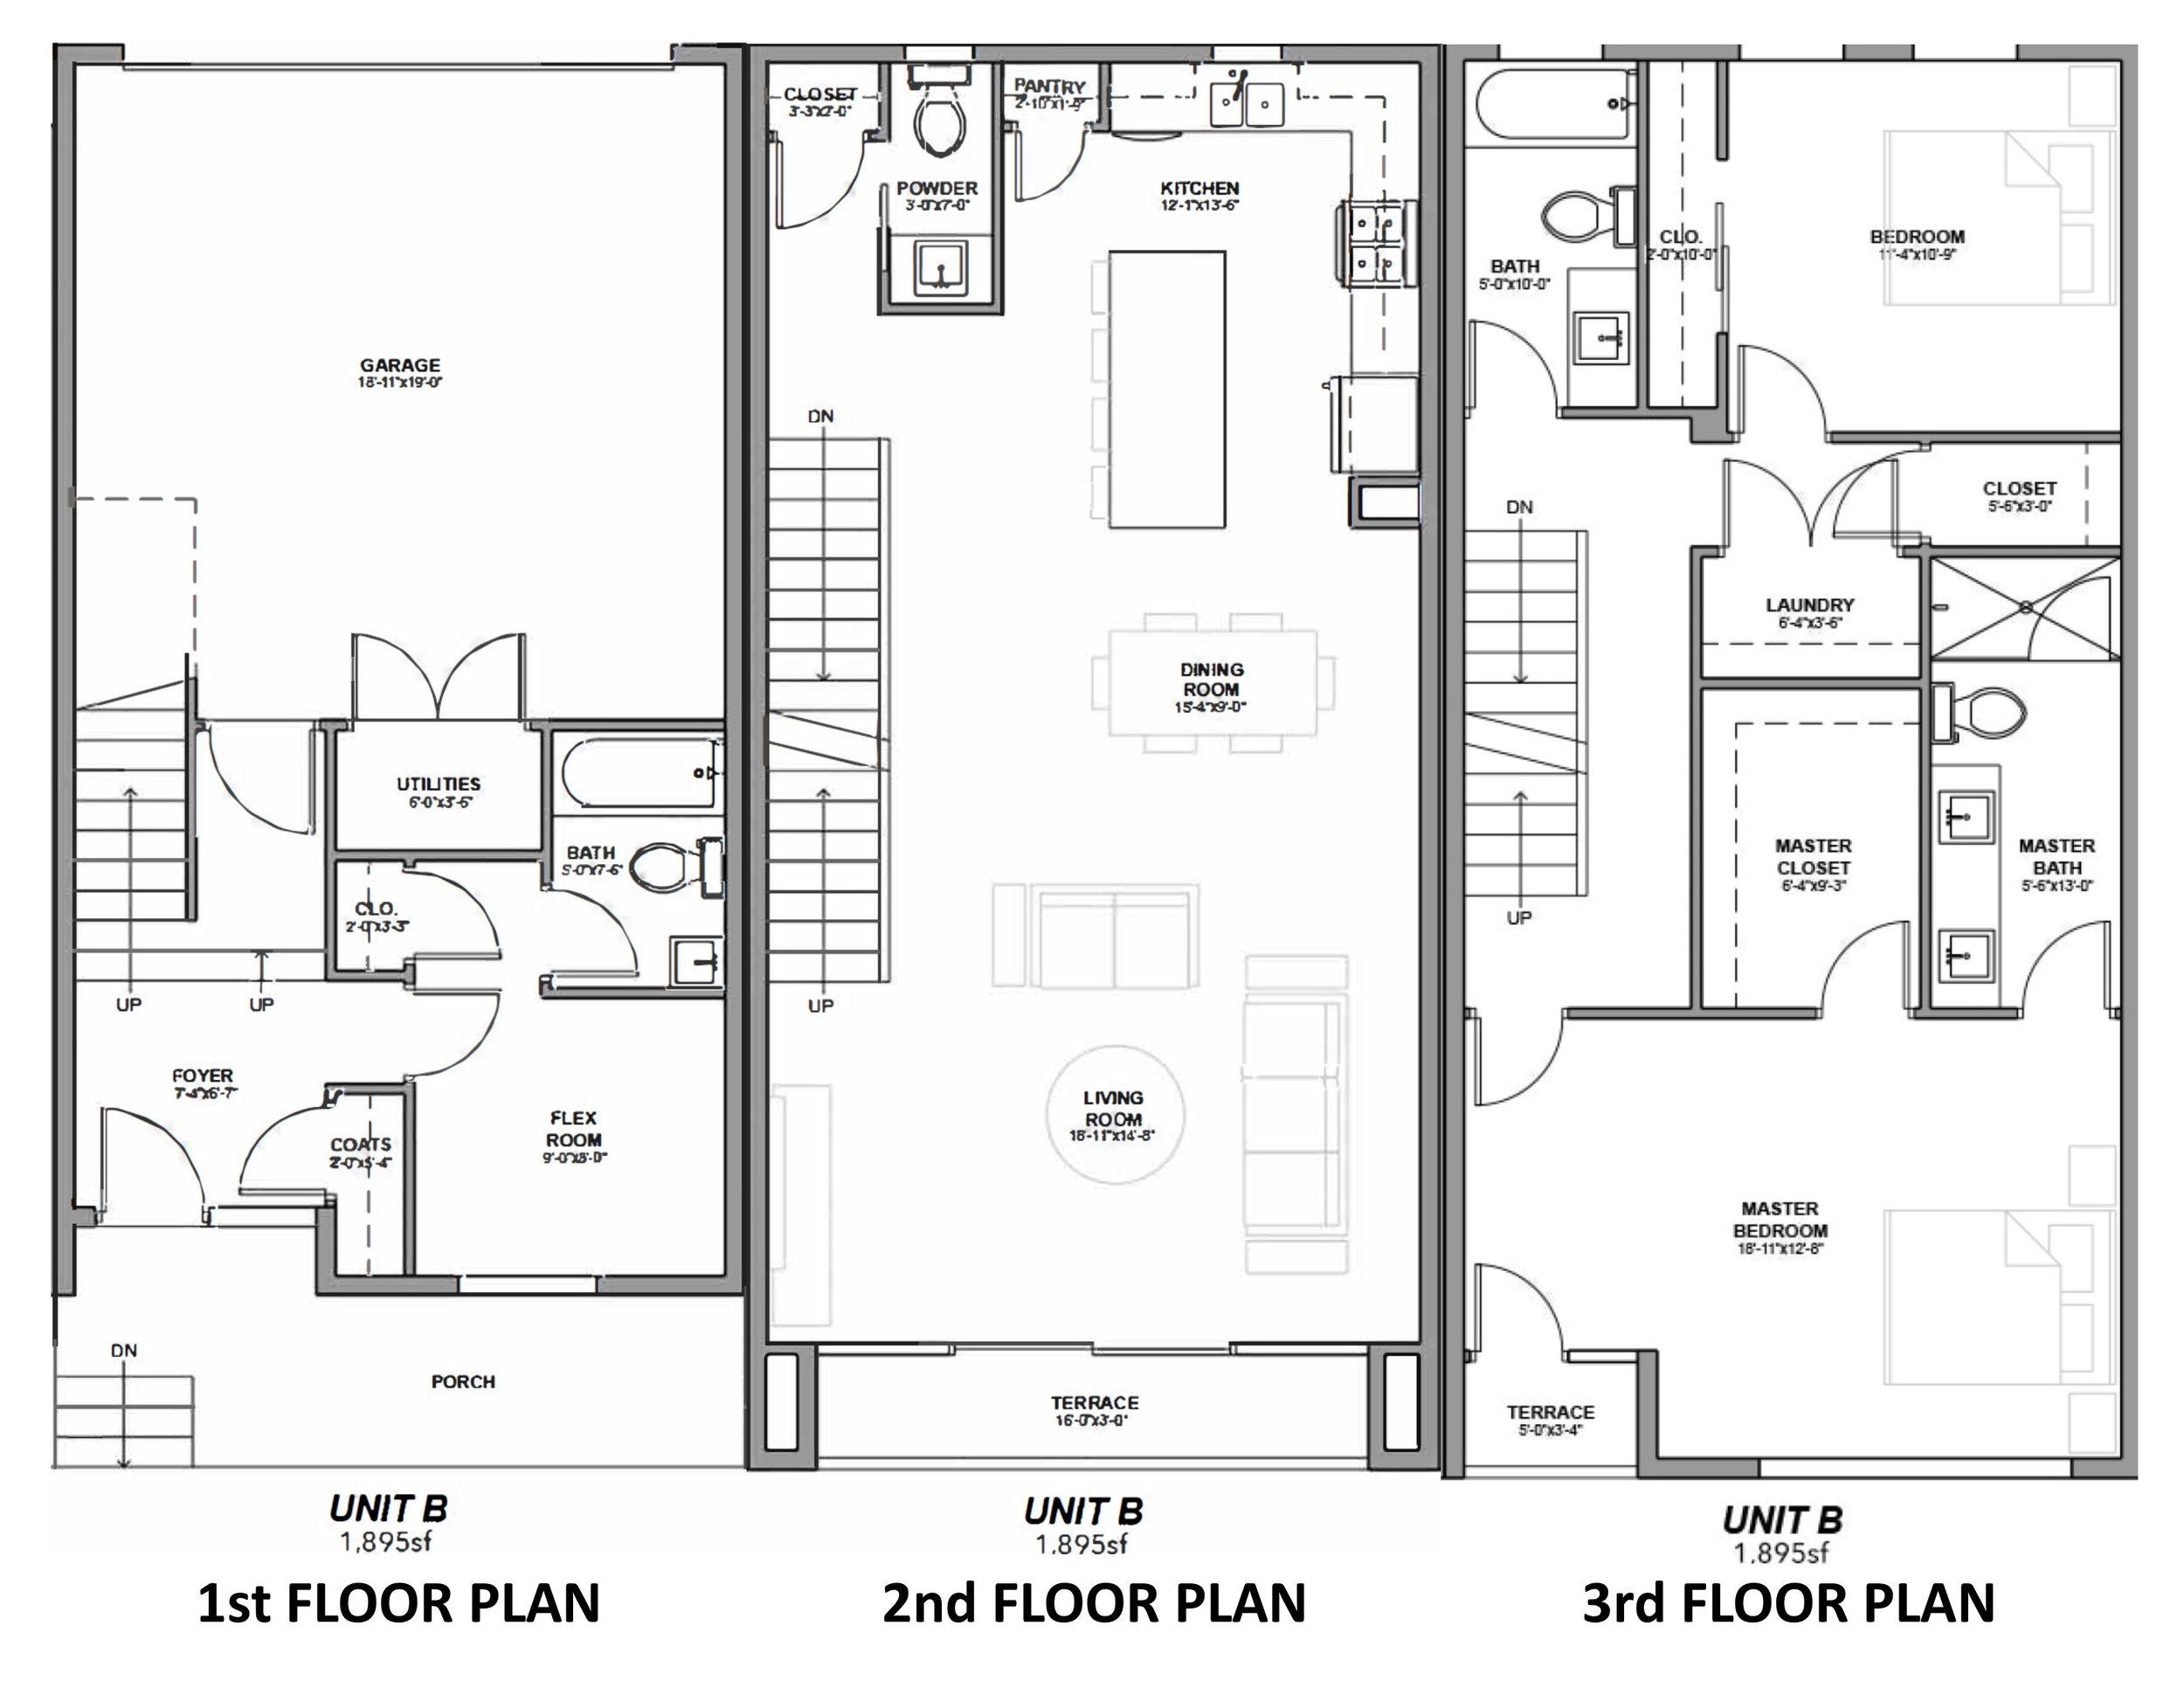 Floorplan Building 2 Unit B 410 Jefferson.jpg